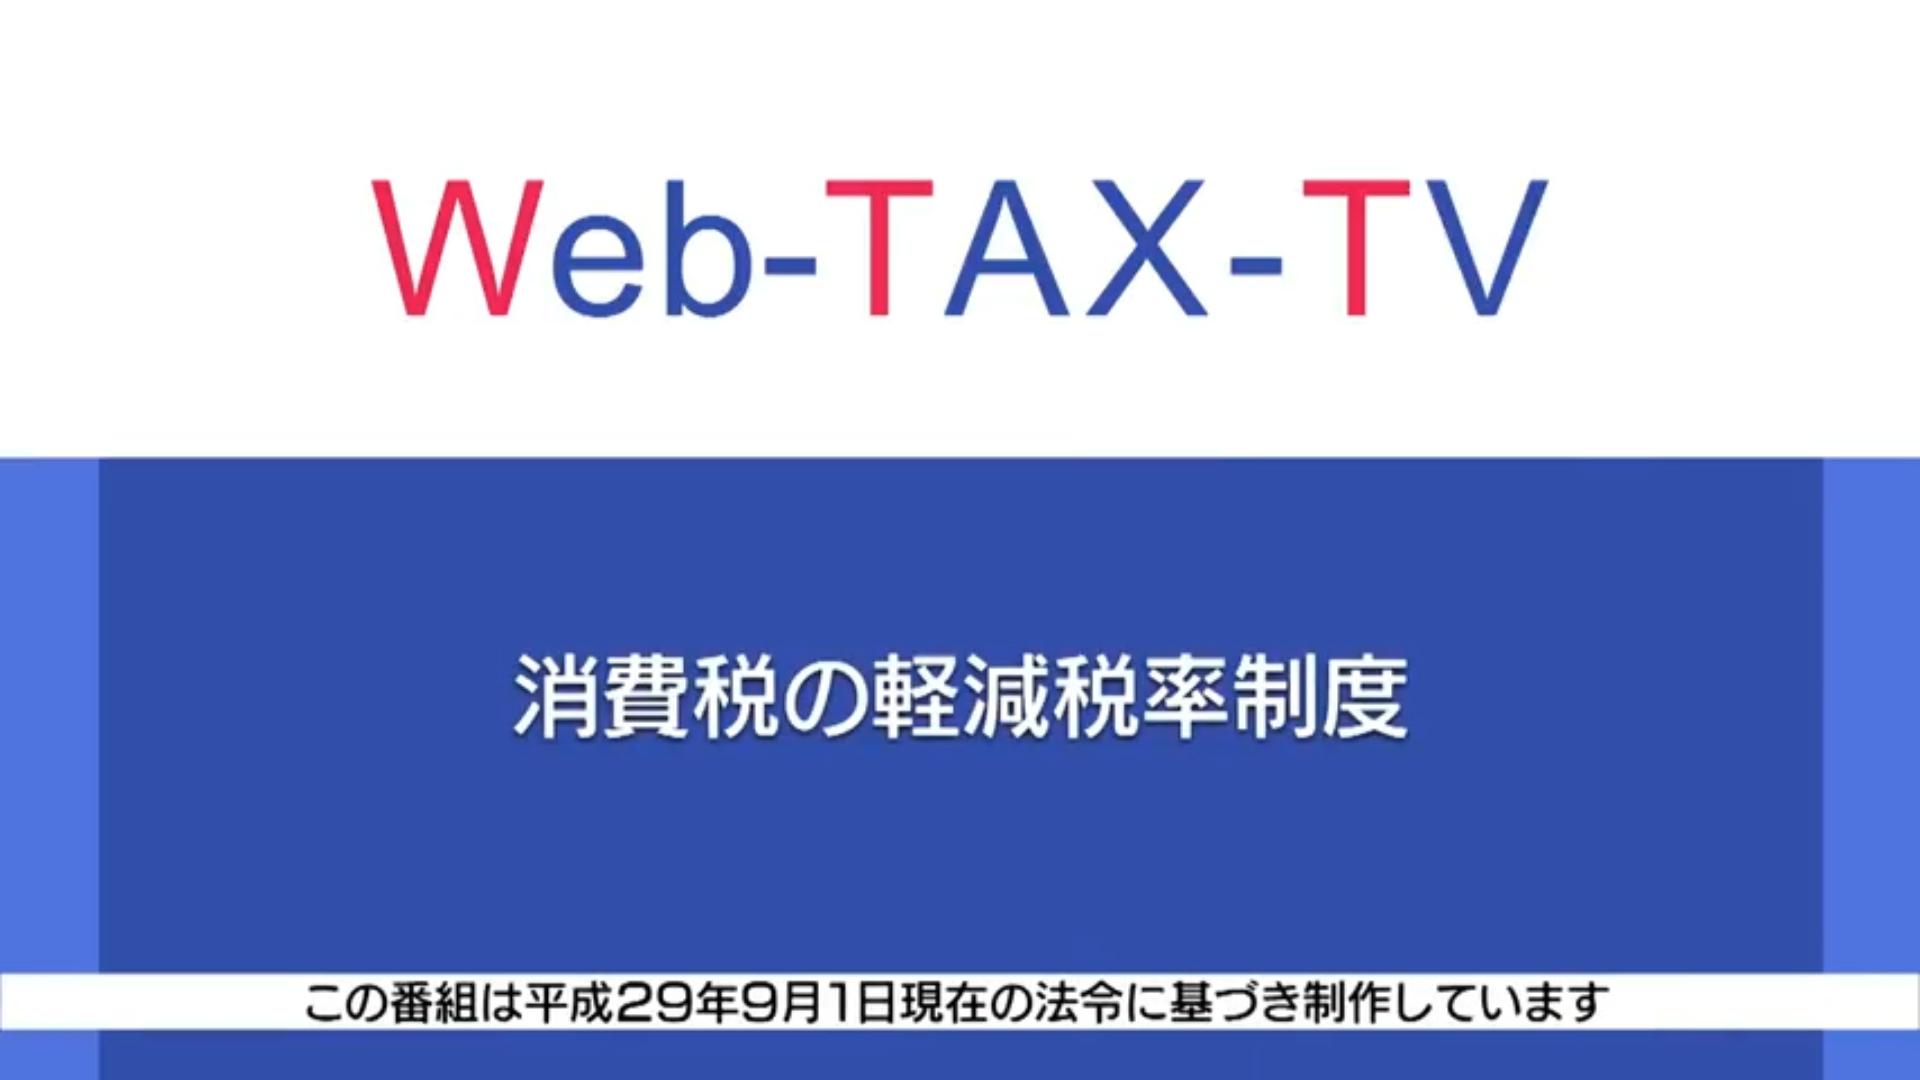 消費税の軽減税率制度解説ムービー